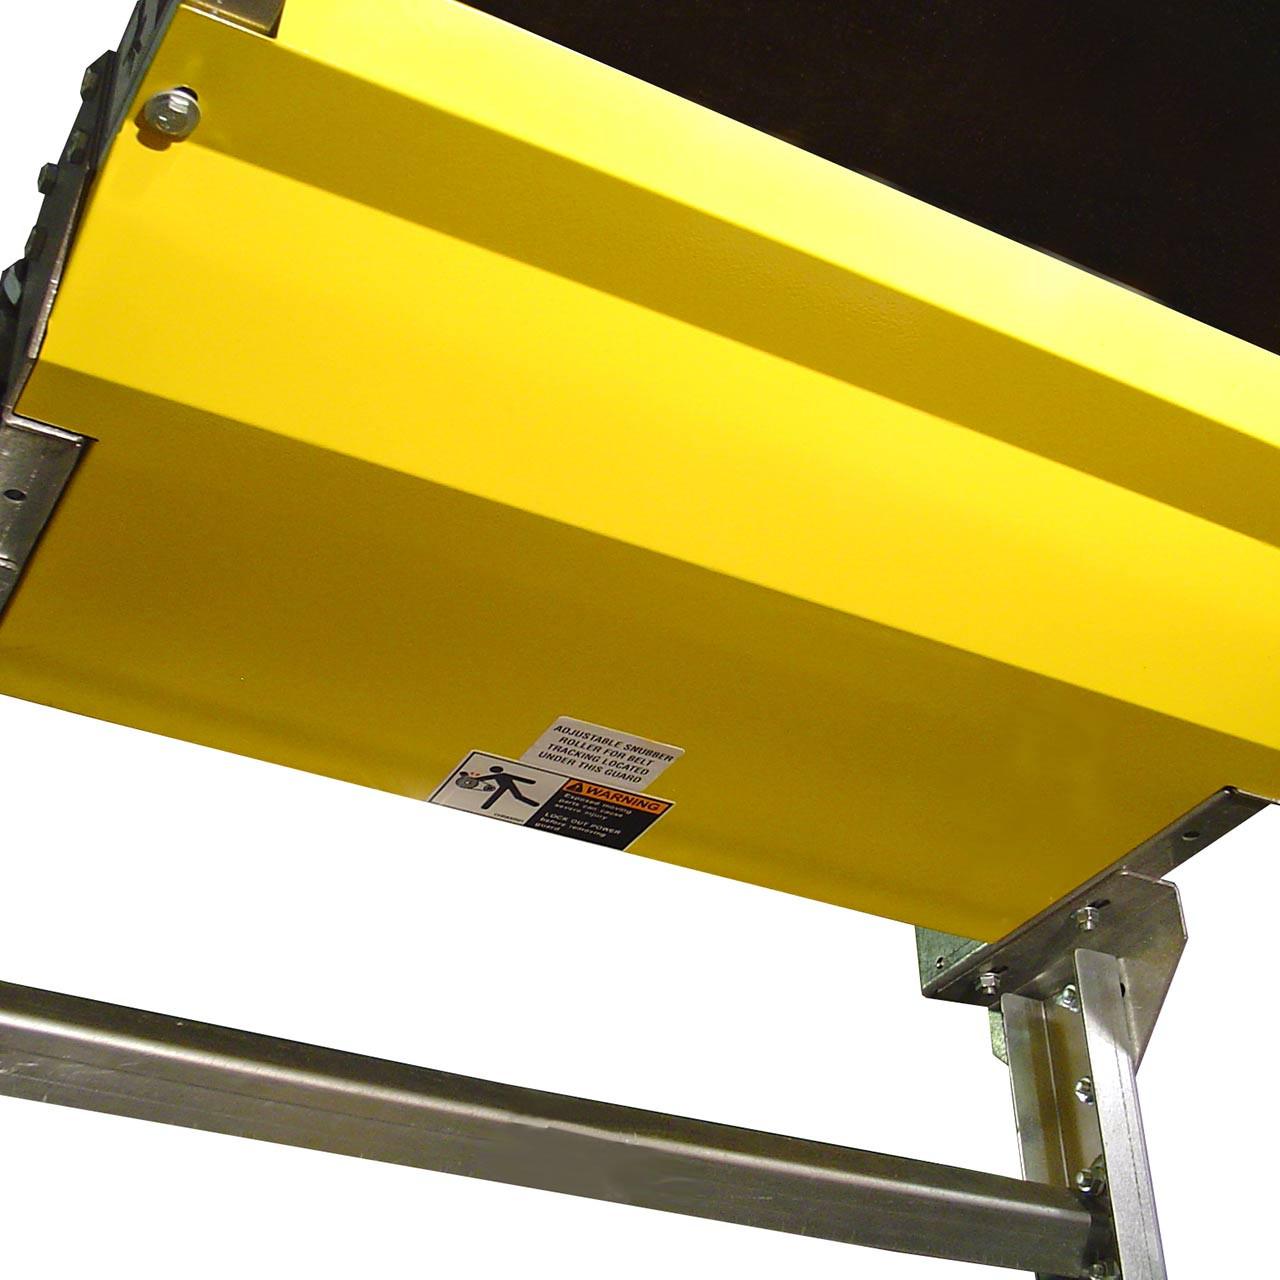 Power belt conveyor snubber guard